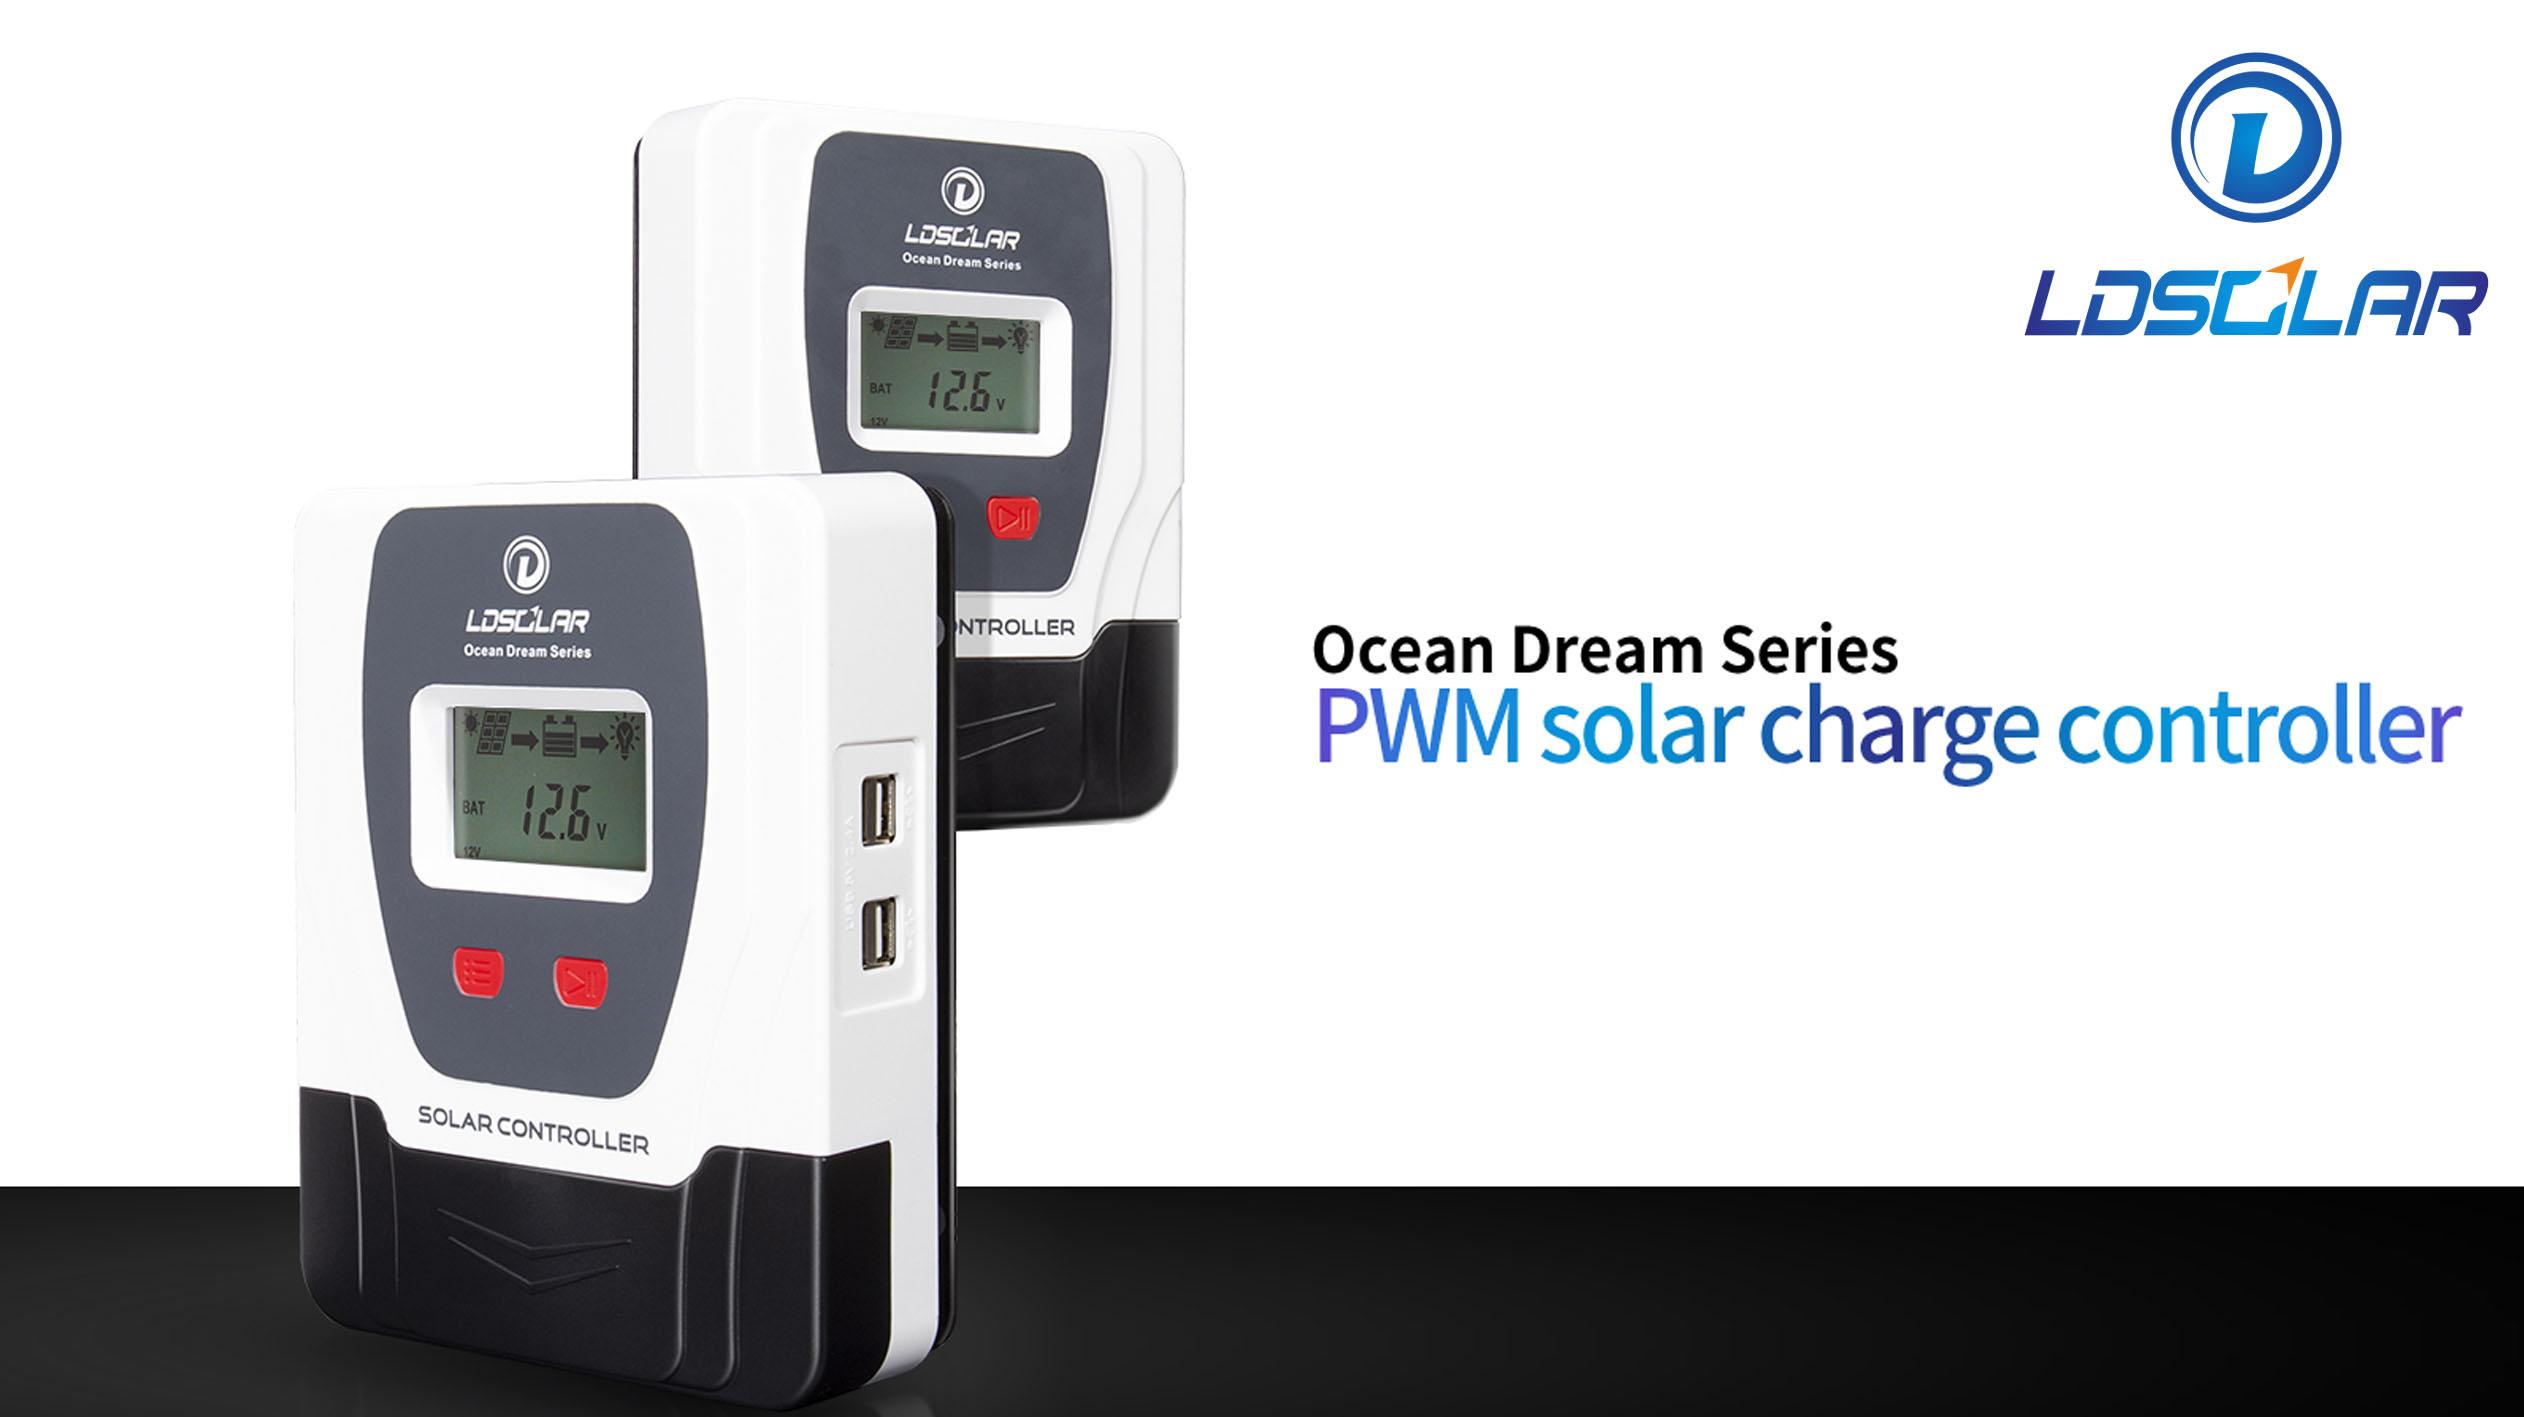 PWM Solarladeregler der Ocean Dream-Serie